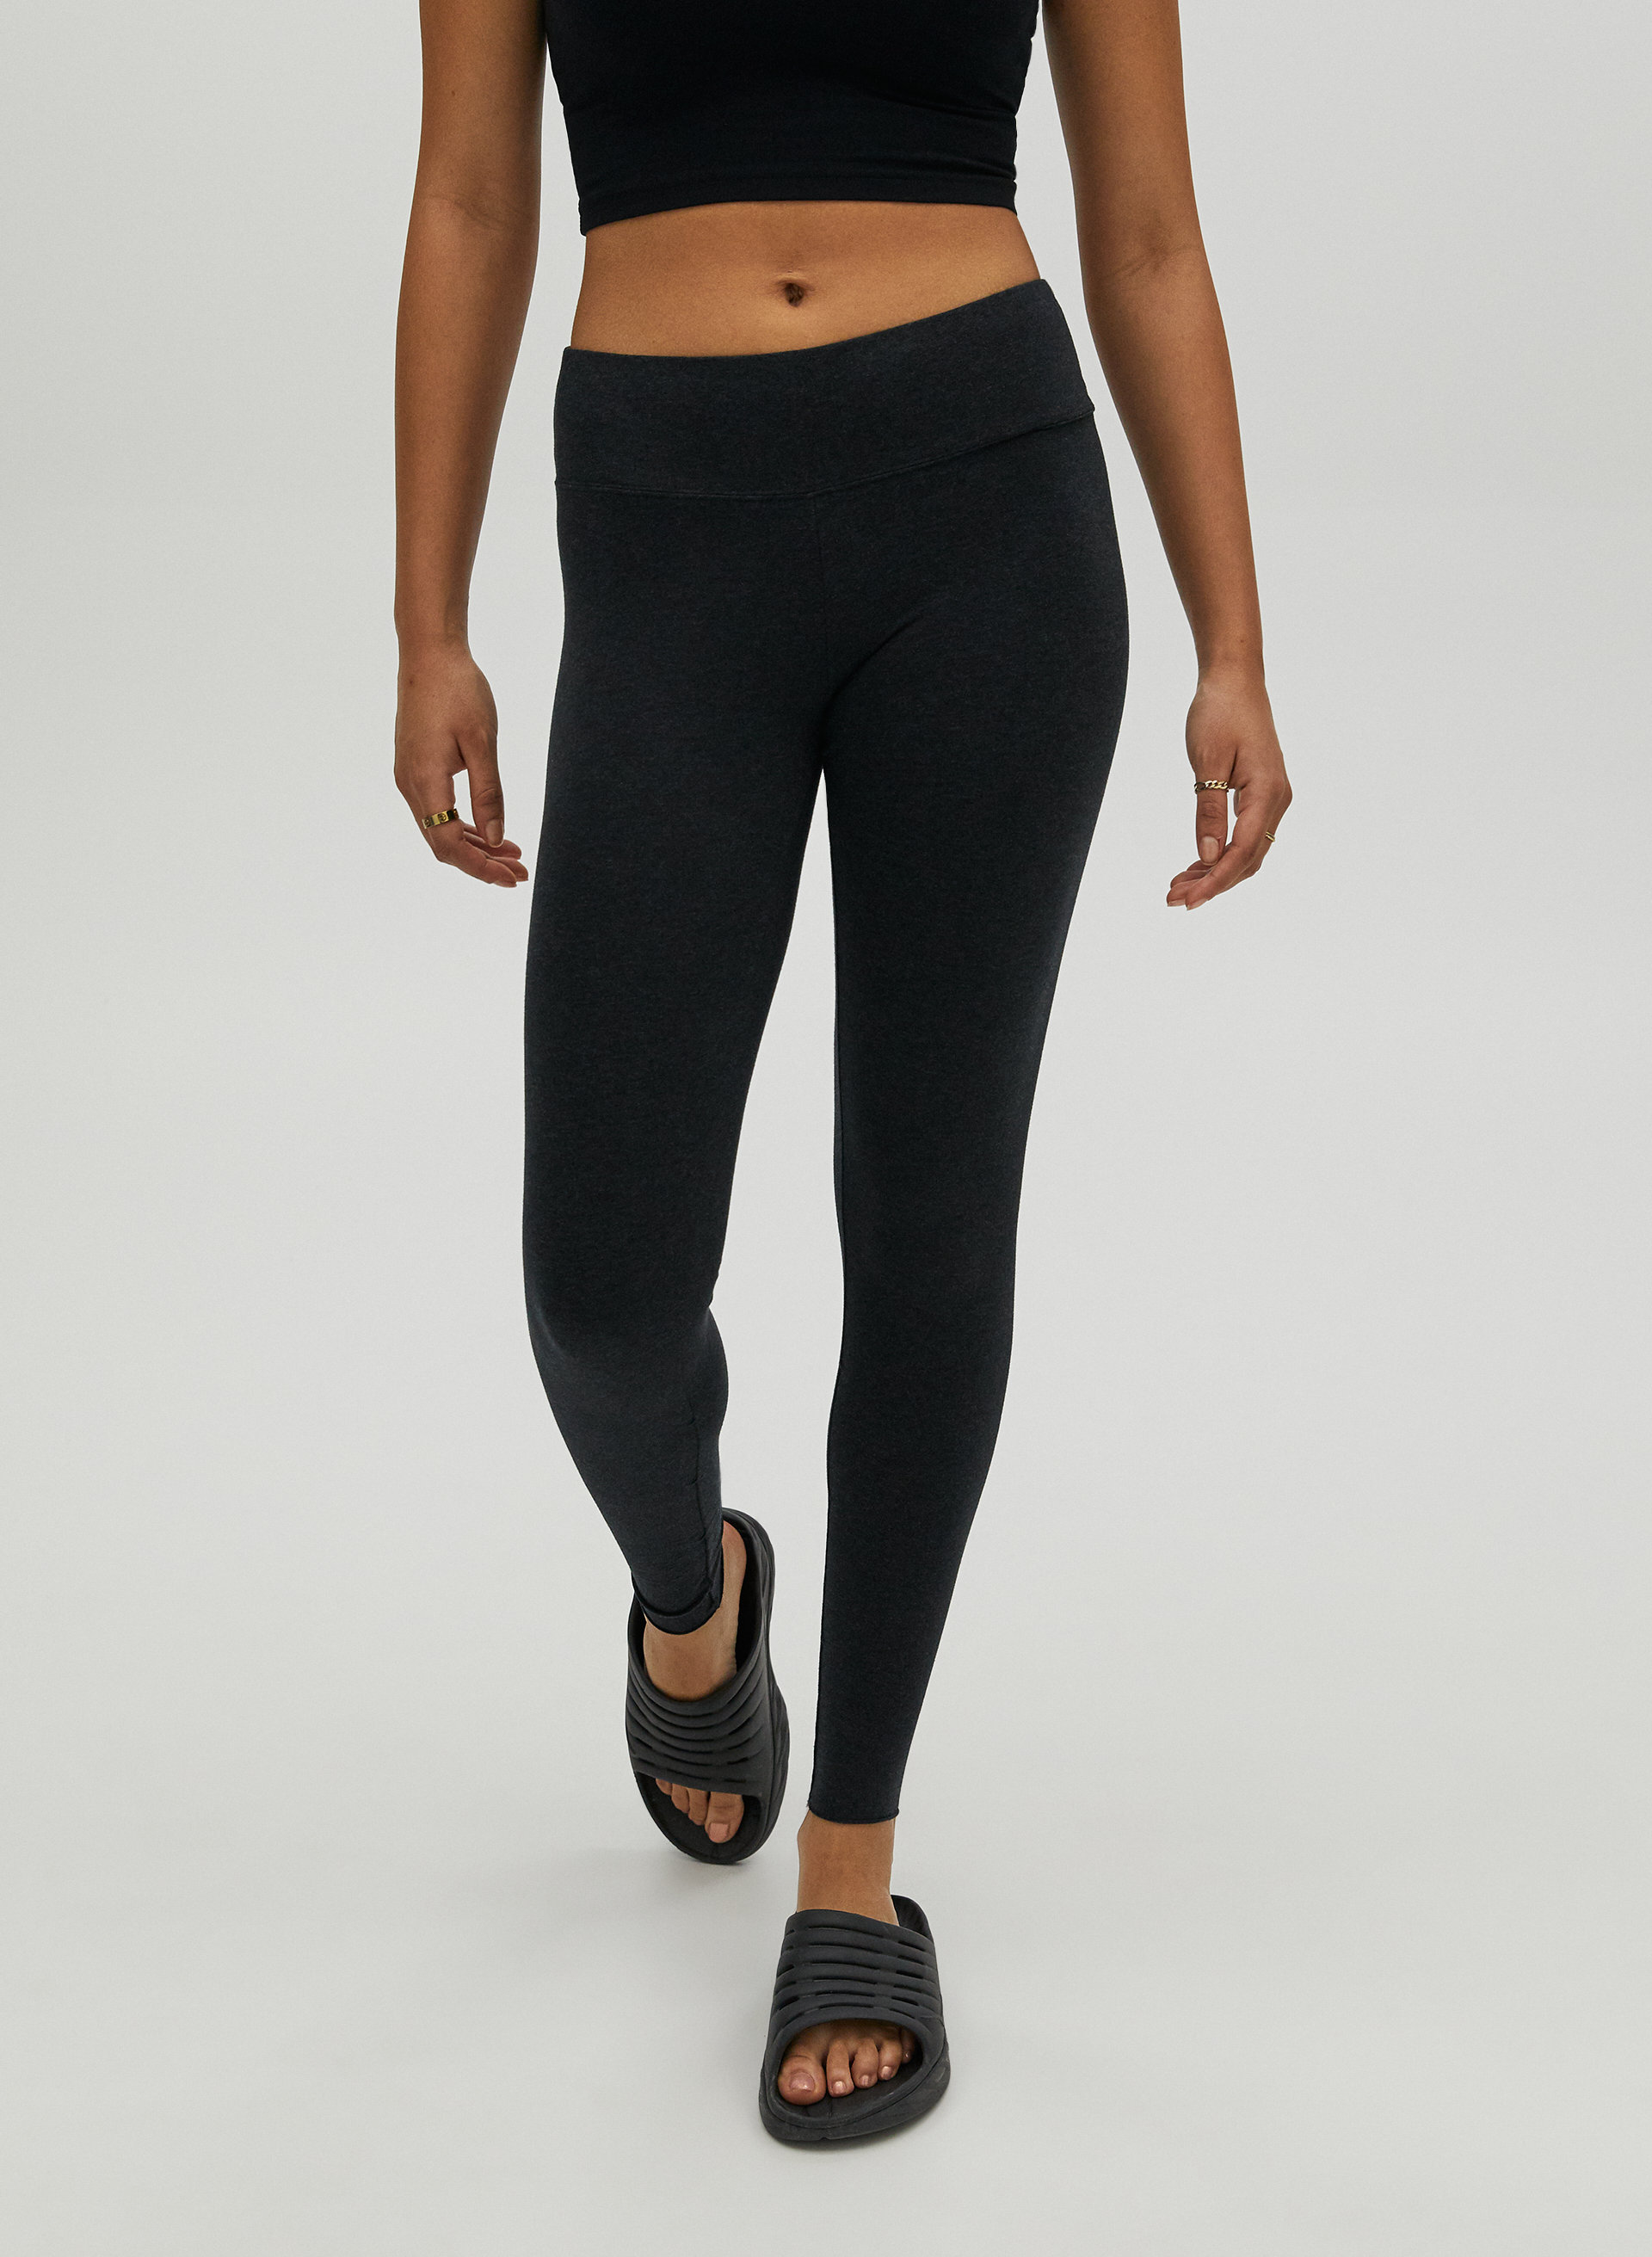 Full Length Cotton Leggings Super Soft All Sizes Black Ankle Length Tight Fitted